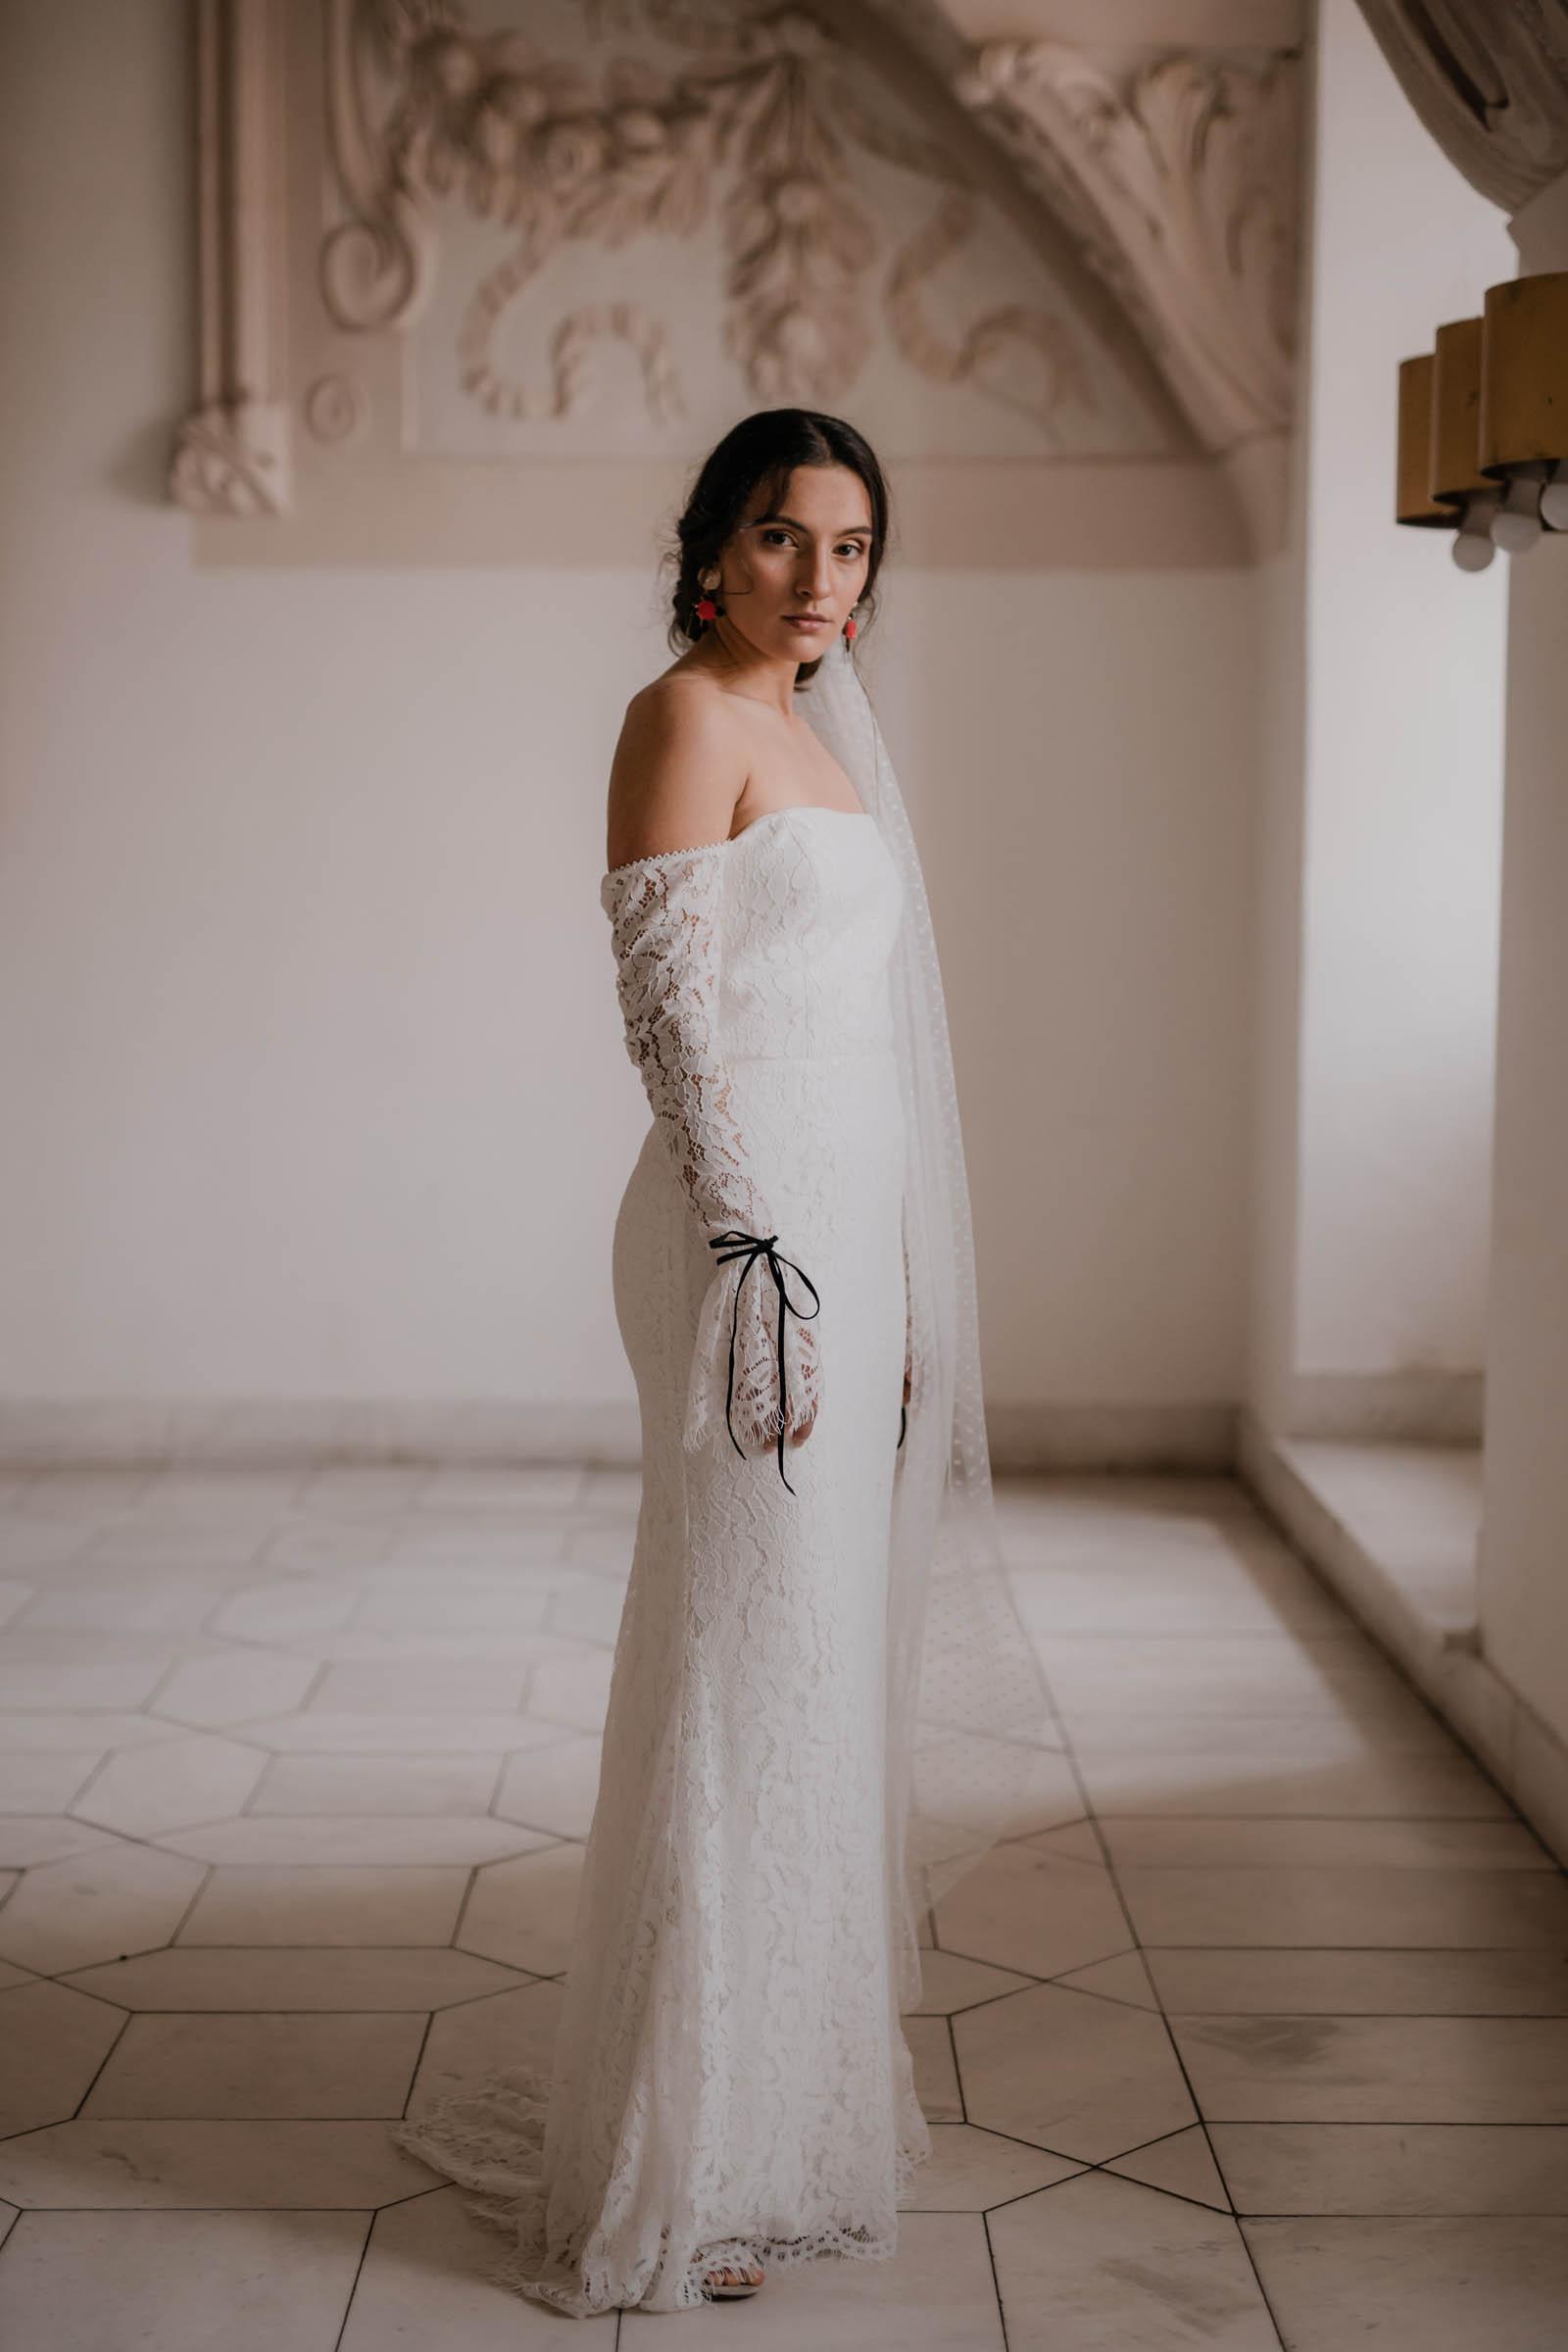 boho-svadobne-saty-veronika-kostkova-wedding-atelier-kolekcia-2019-alba